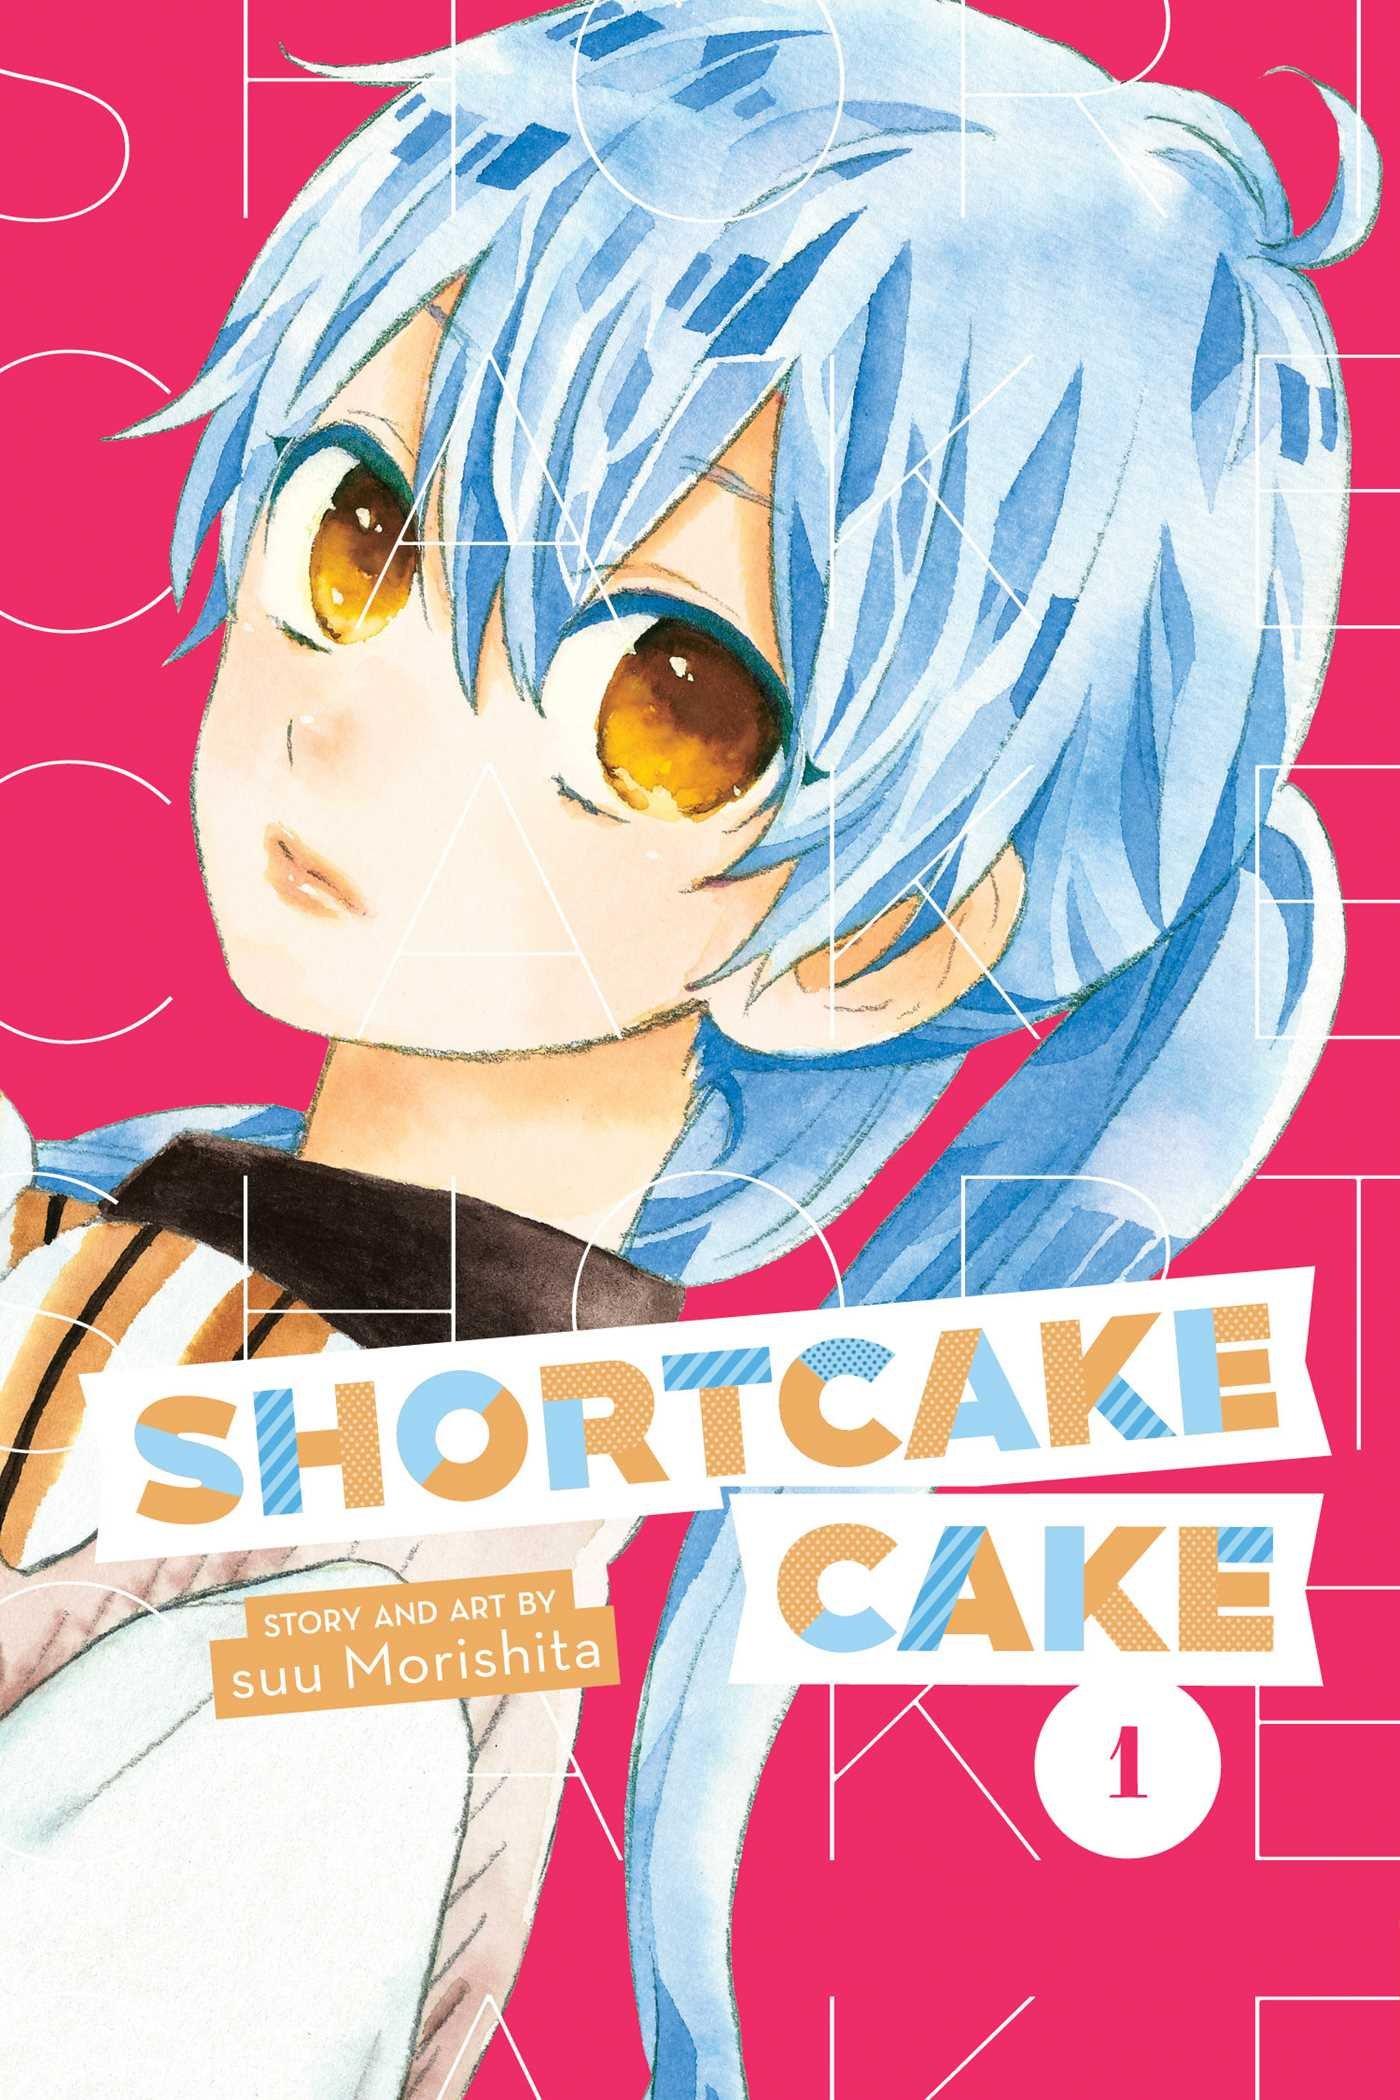 Shortcake Cake, Vol. 1 (Volume 1) : Morishita, suu: Amazon.ca: Books